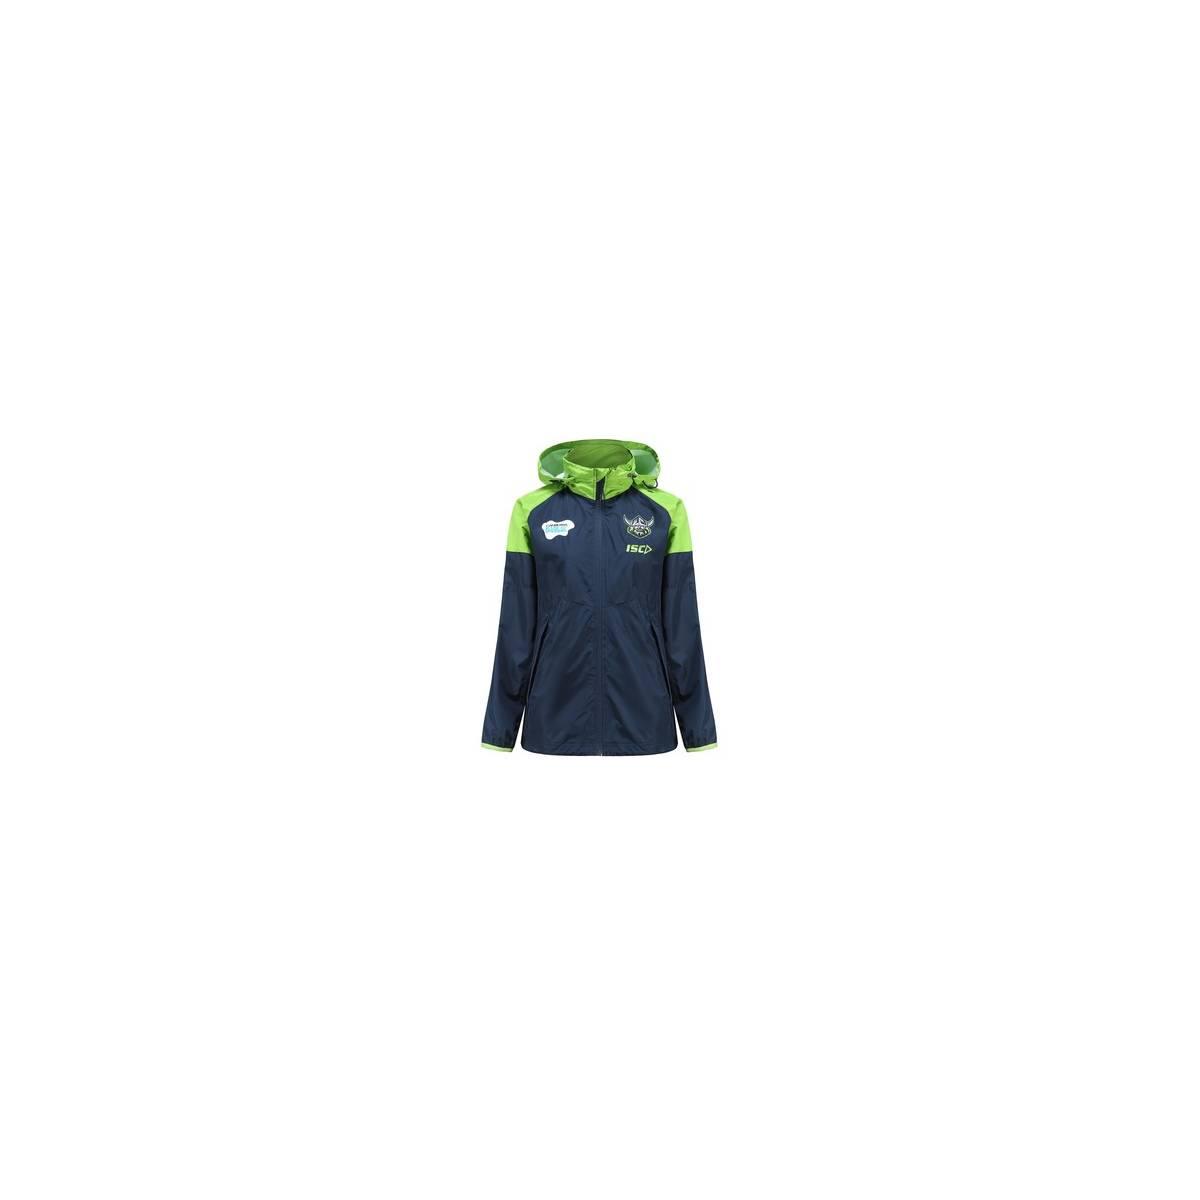 2021 Ladies Wet Weather Jacket3